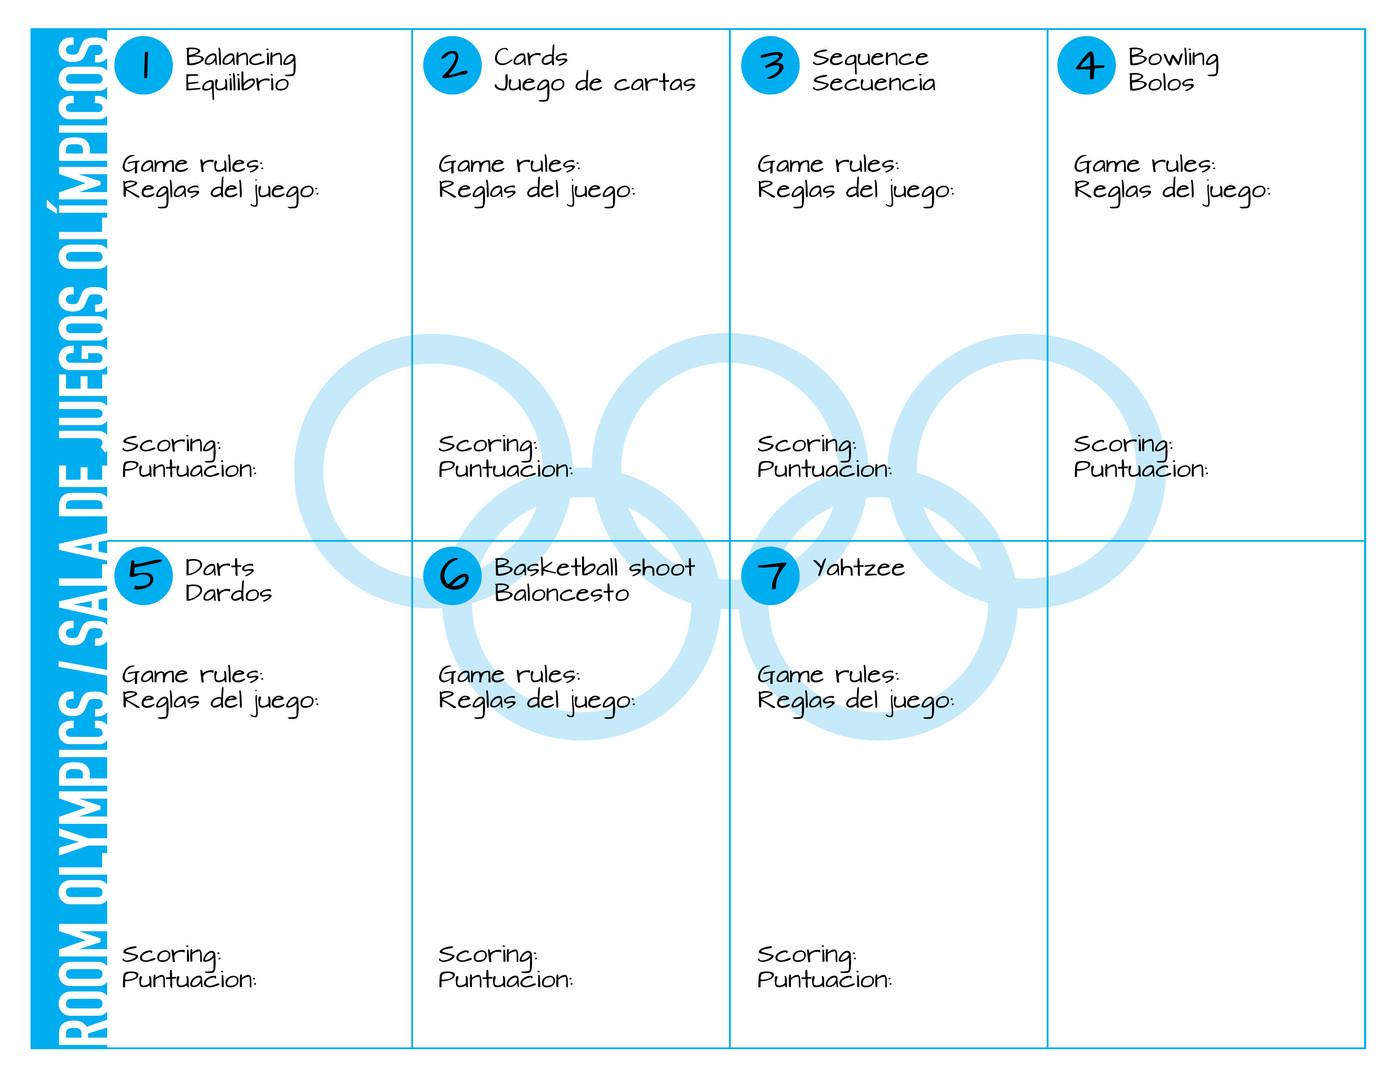 Room olympics_2.jpg